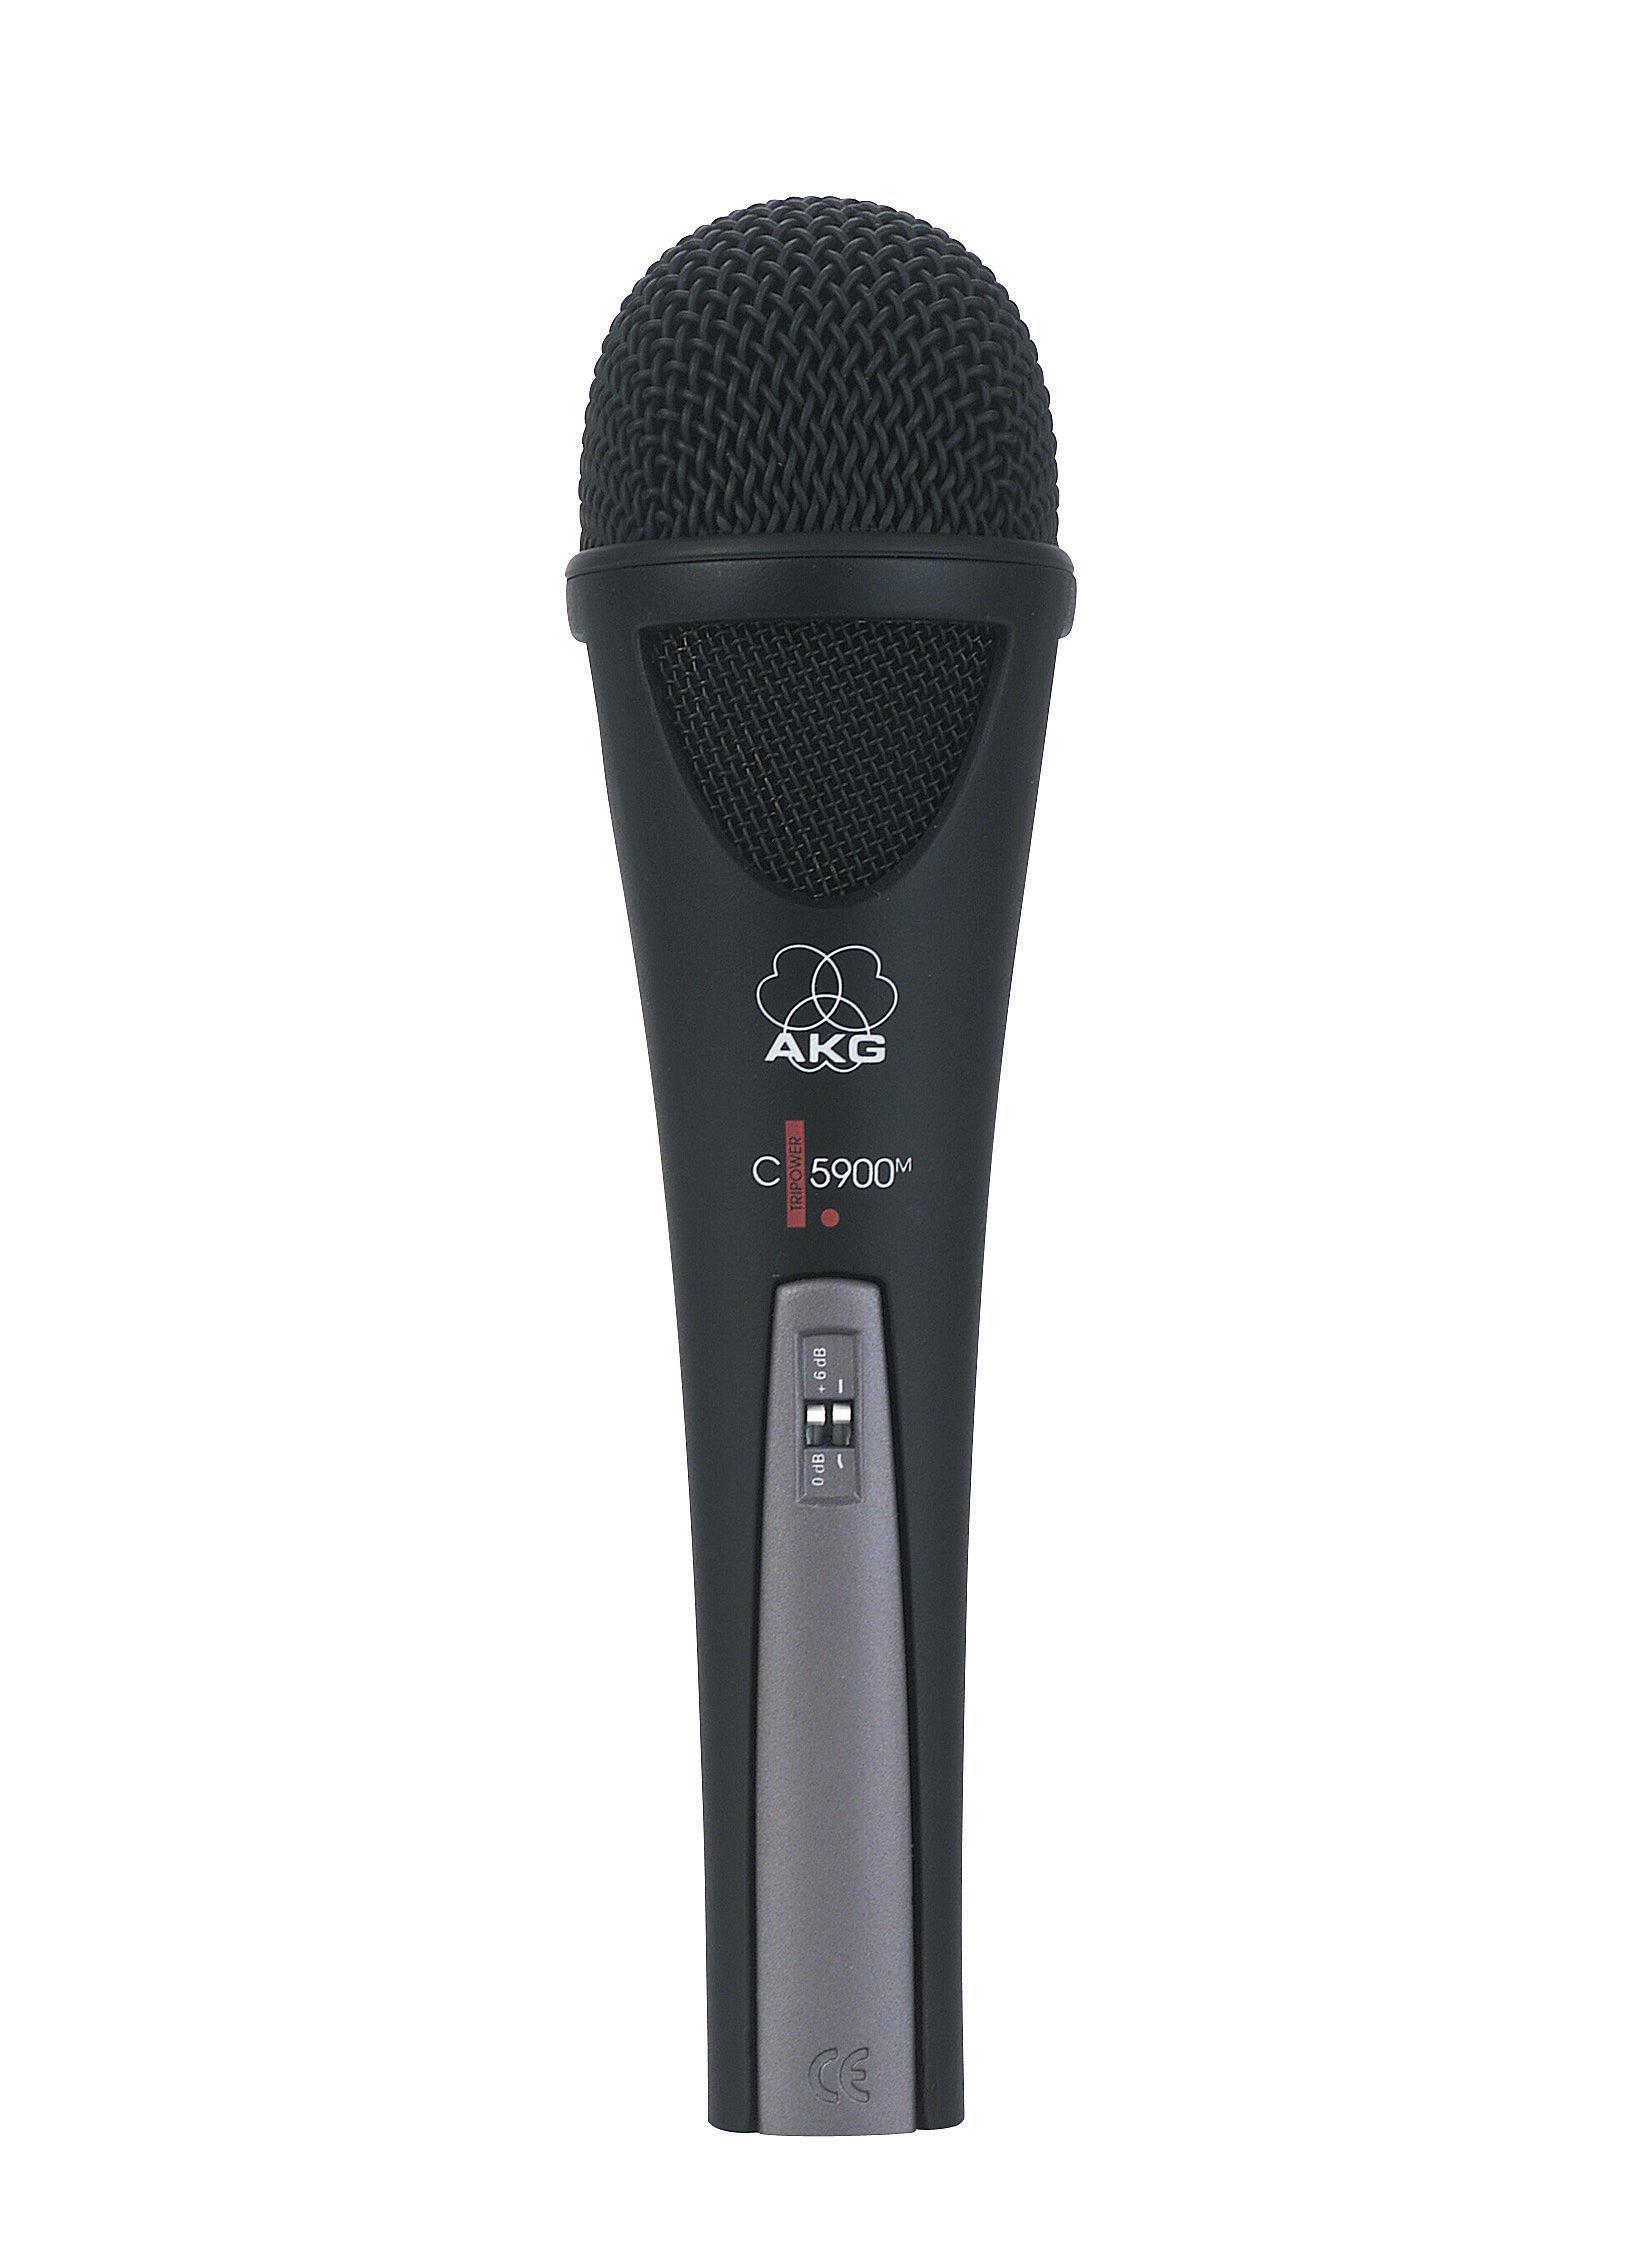 AKG C 5900M